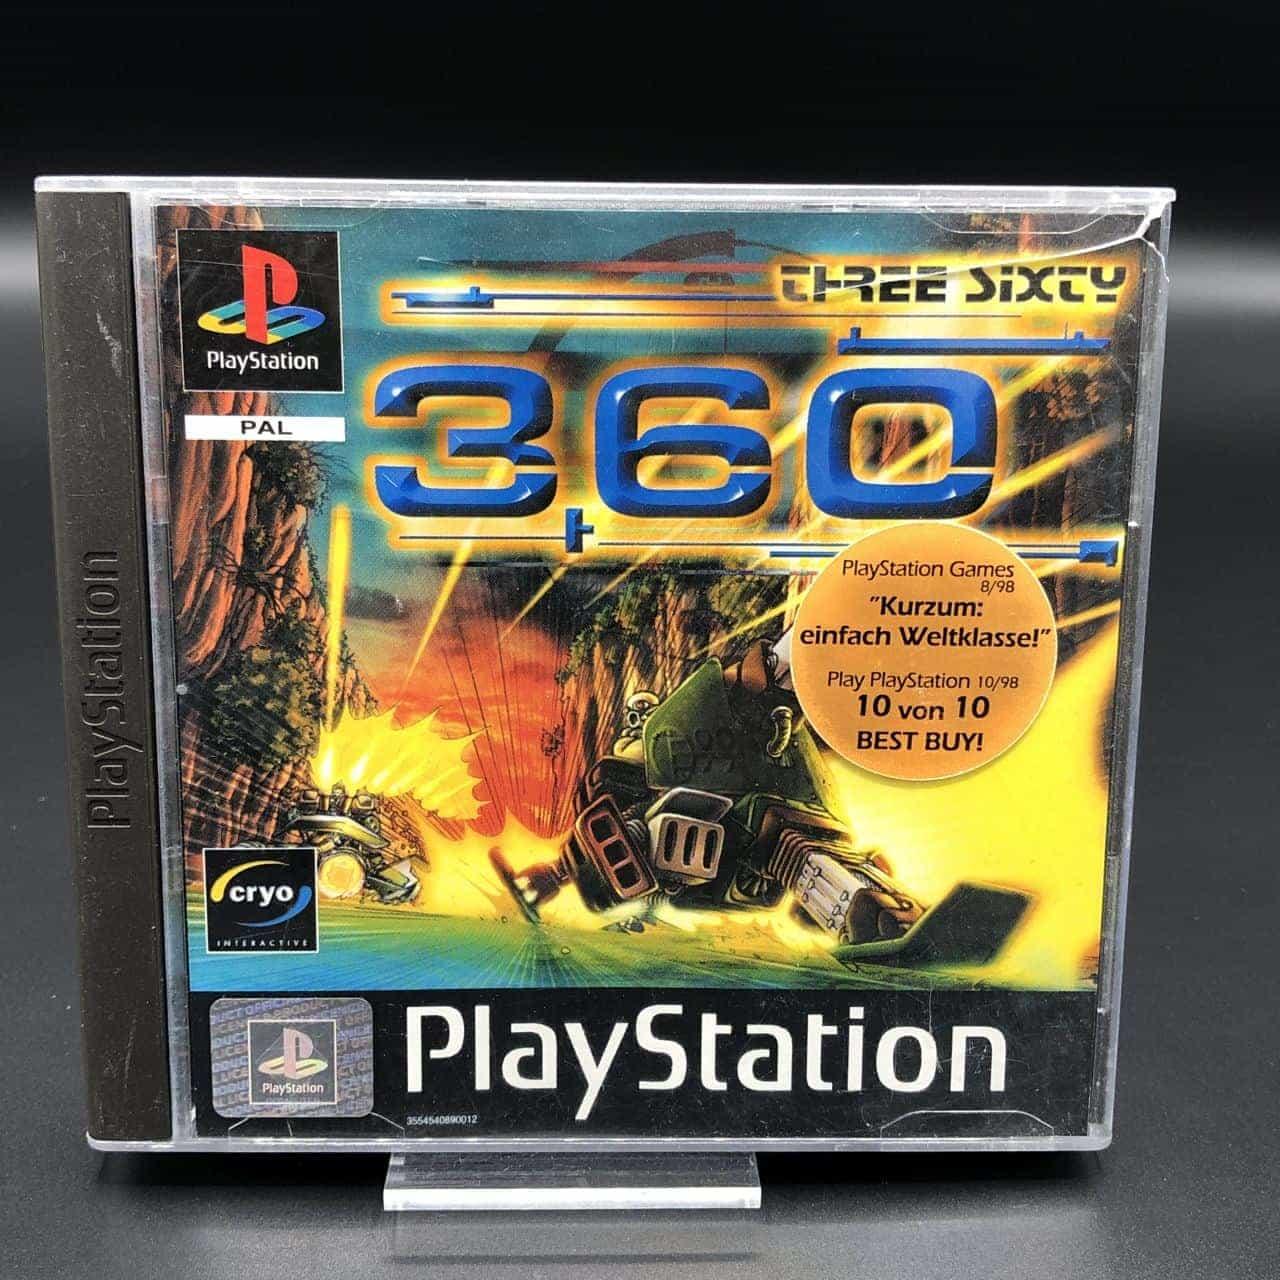 PS1 360: Three Sixty (Komplett) (Sehr gut) Sony PlayStation 1